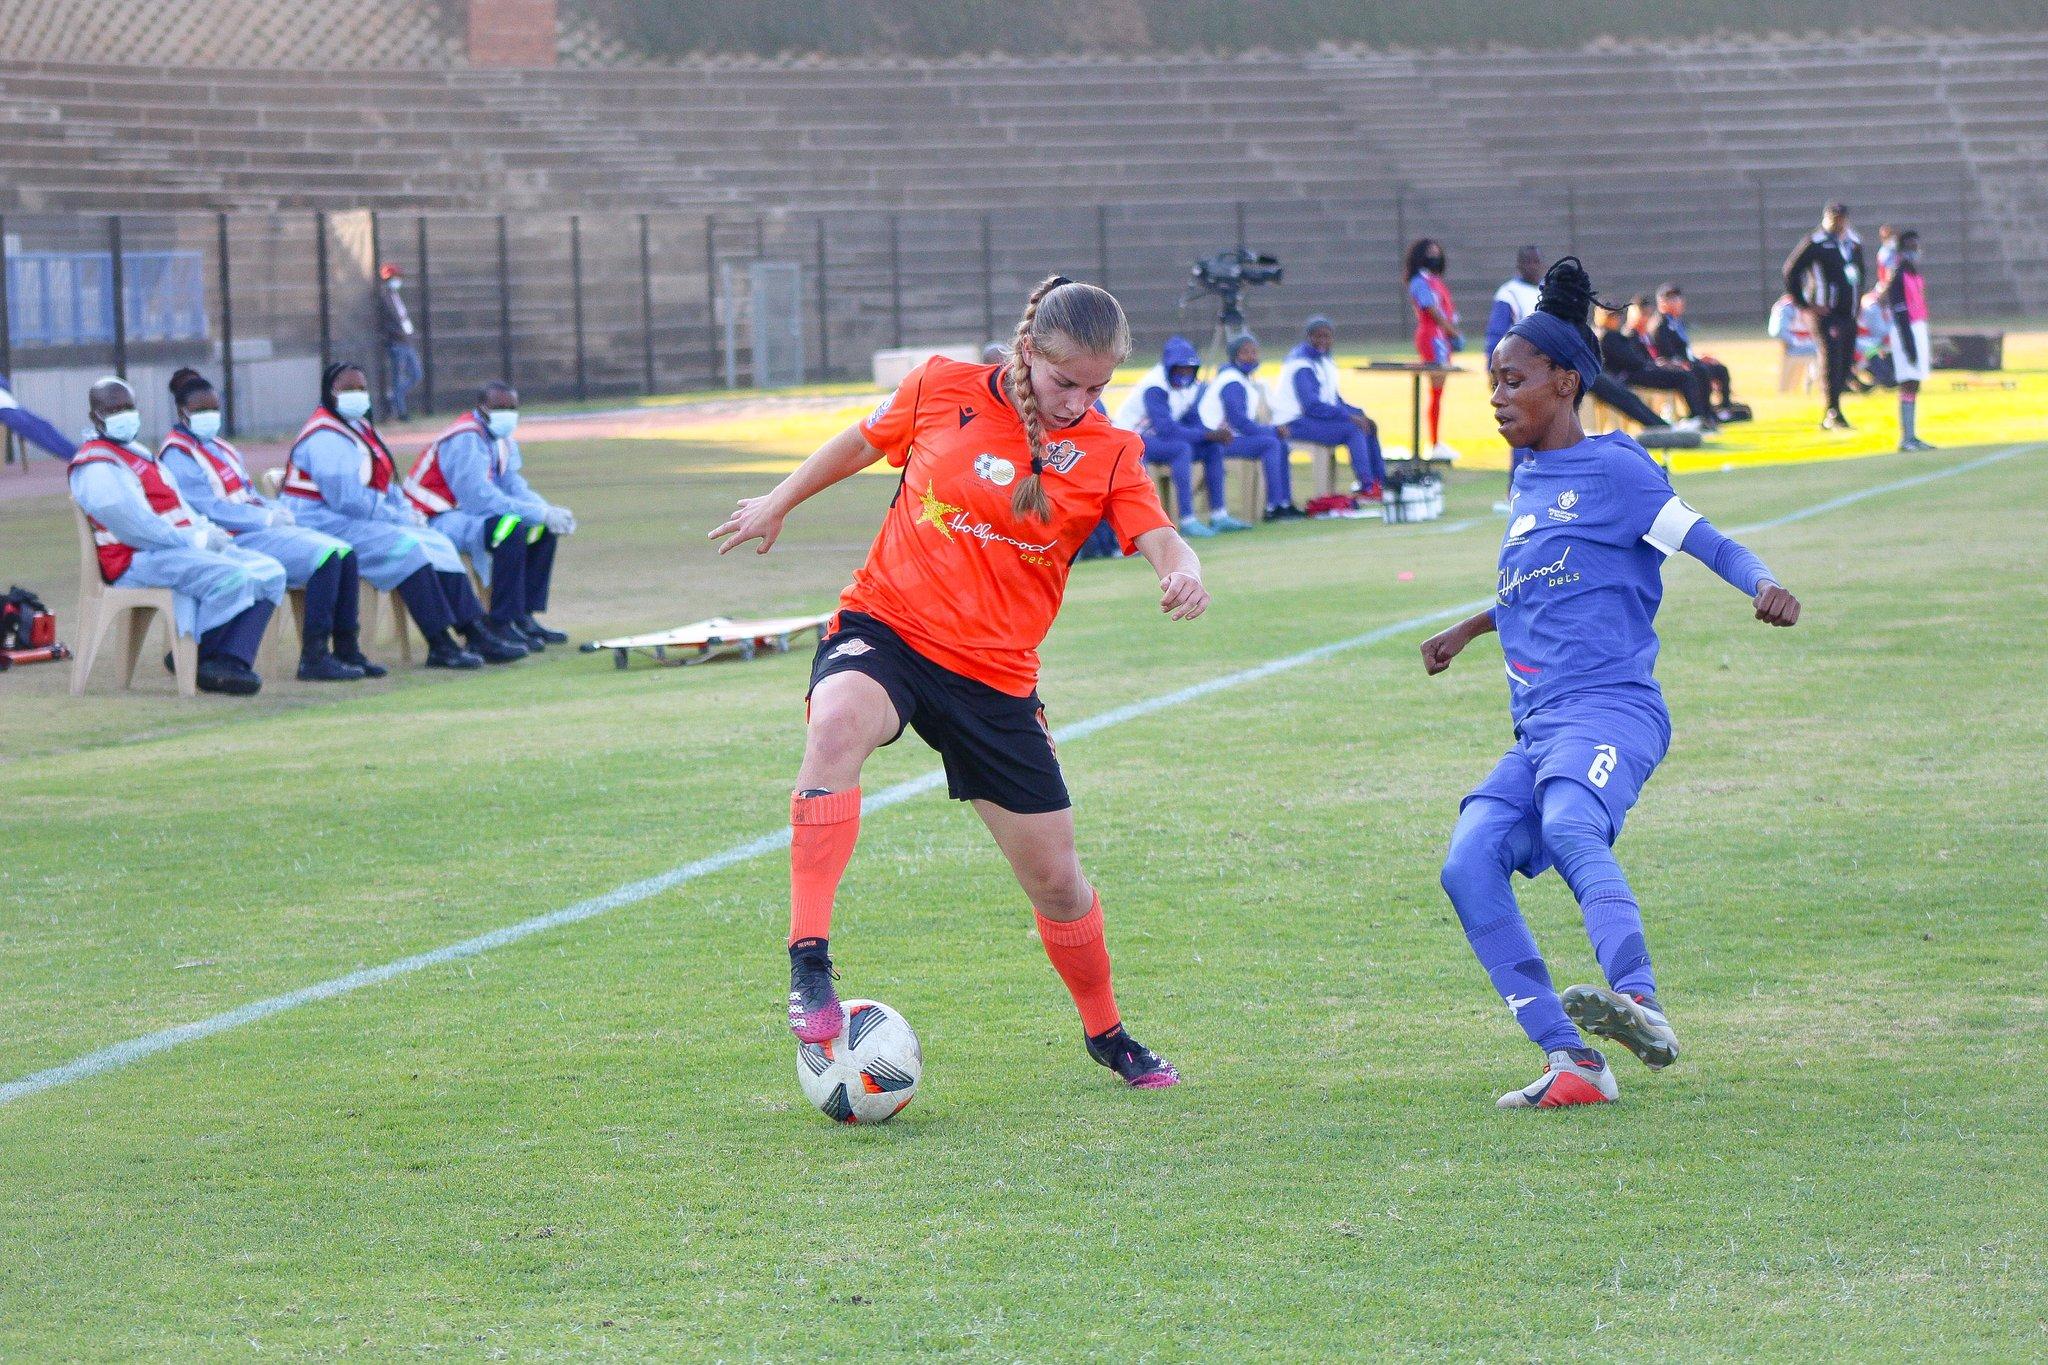 Kgabo Ditsebe's UJ Ladies target three points against Thunderbirds on Saturday